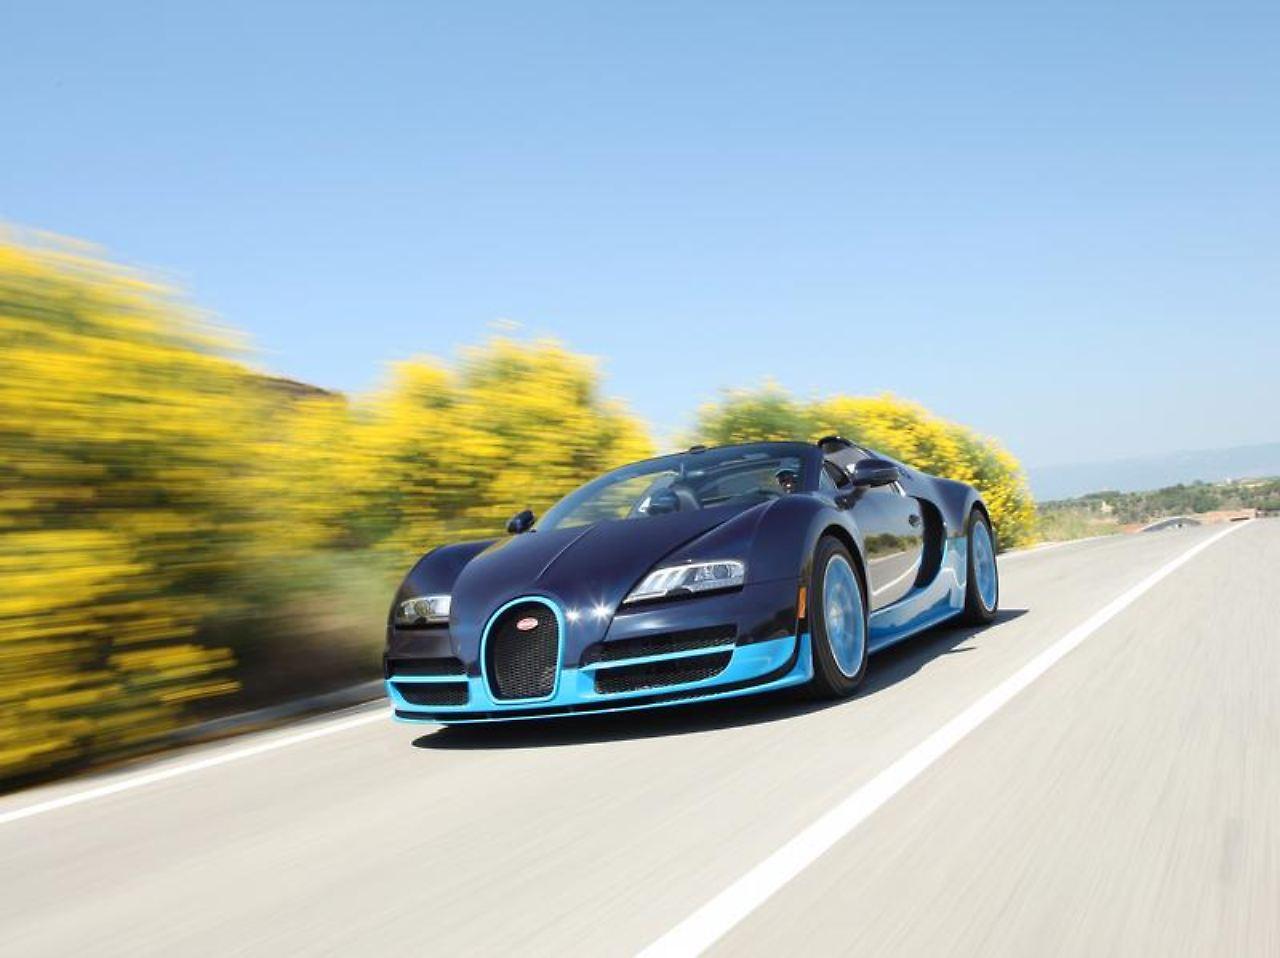 veyron vitesse f r zwei millionen euro 1200 ps f r neuen super bugatti n. Black Bedroom Furniture Sets. Home Design Ideas